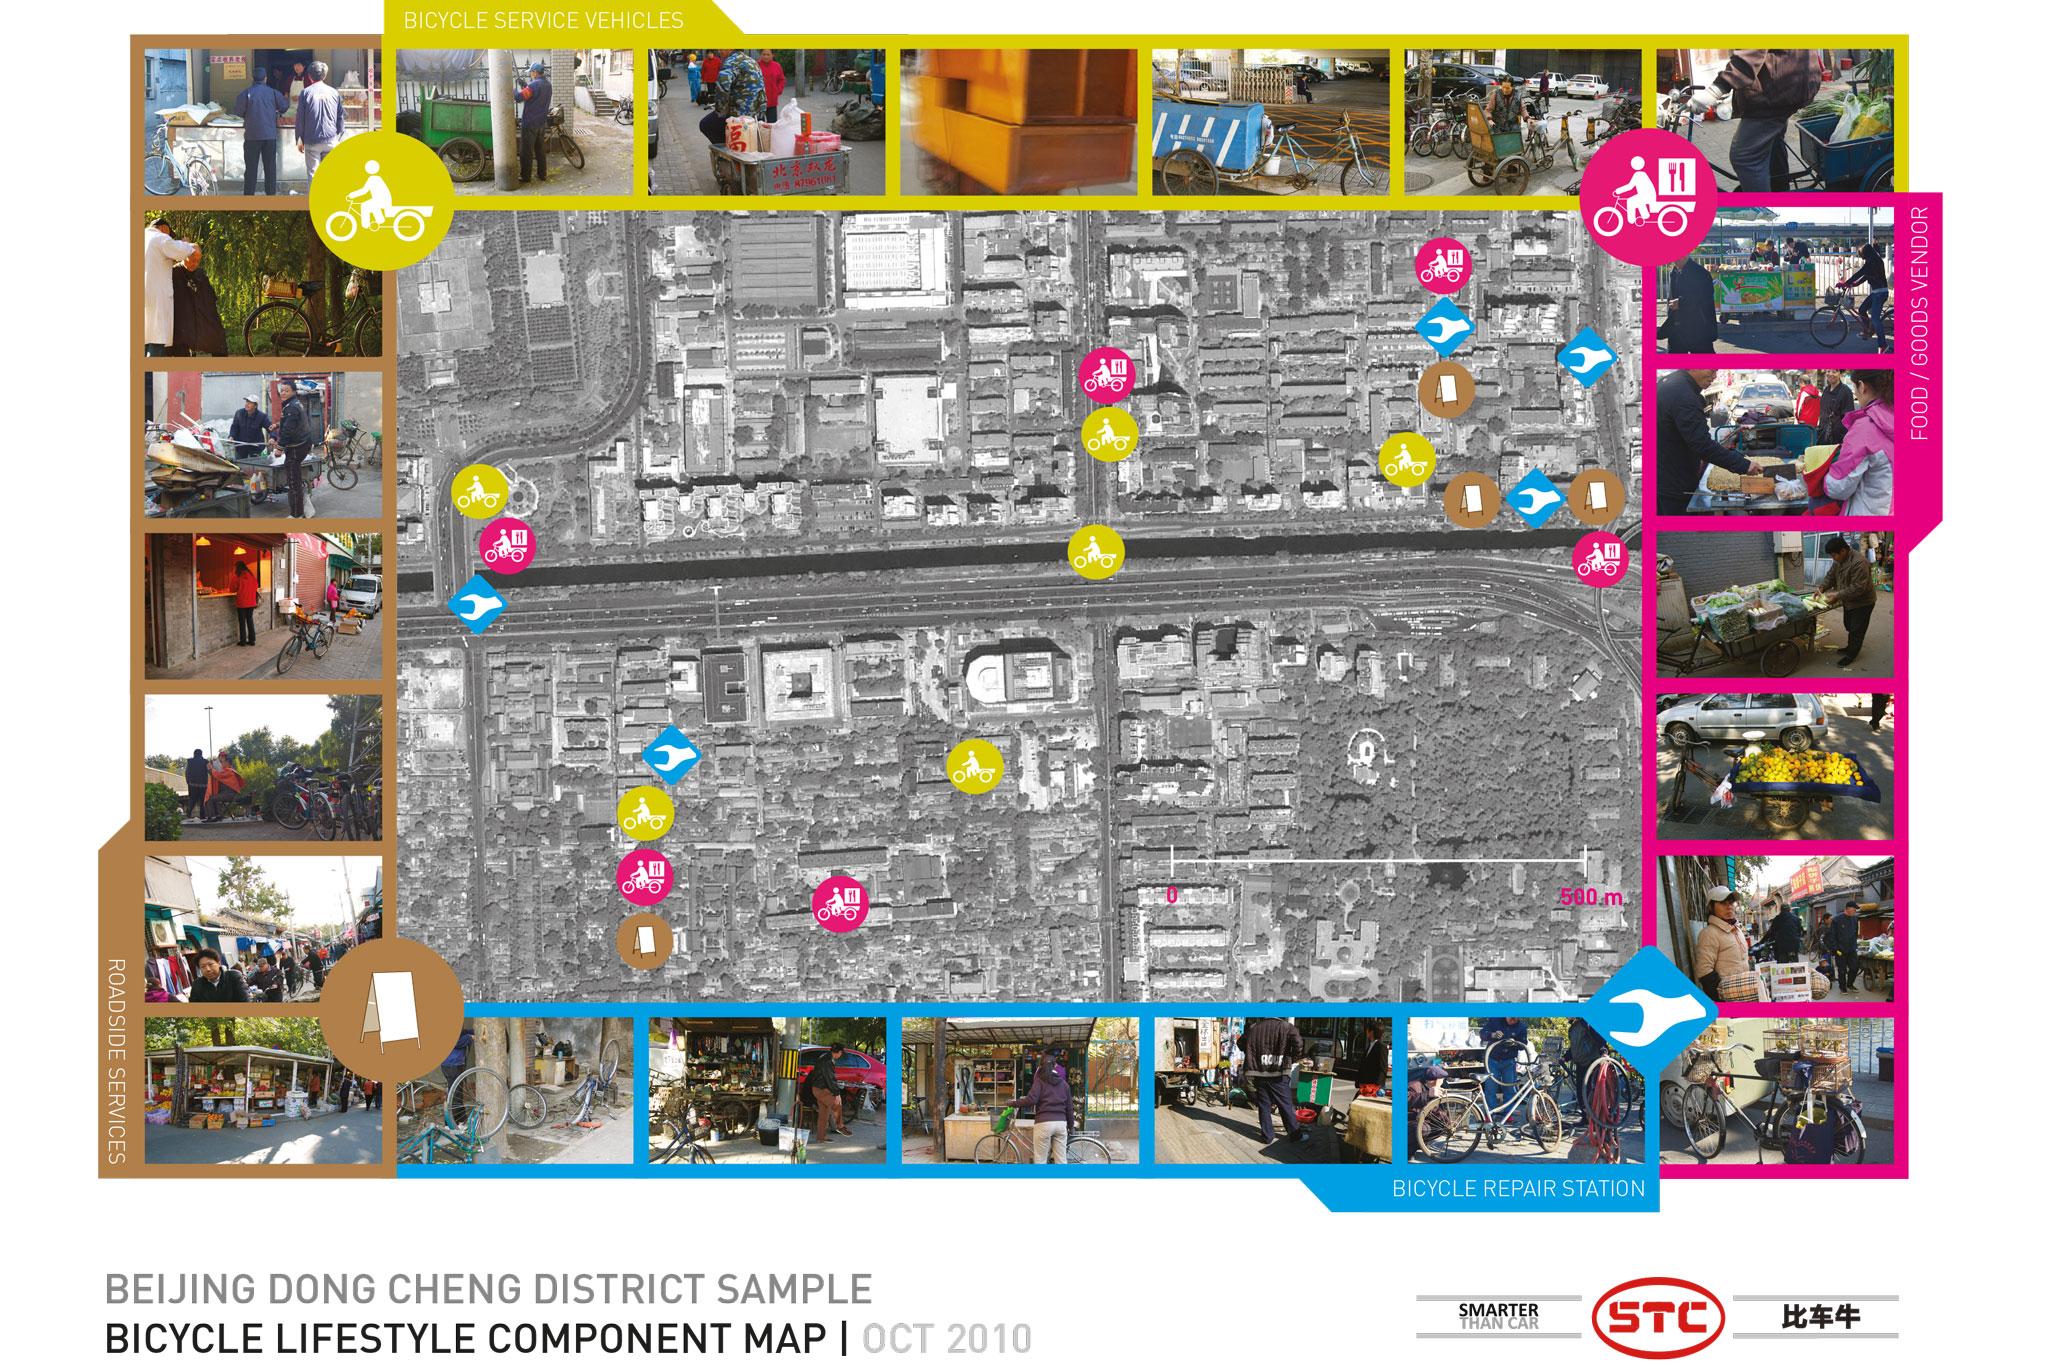 SmarterThanCar_2010_Beijing-Biccle-Livelihoods_Component-map